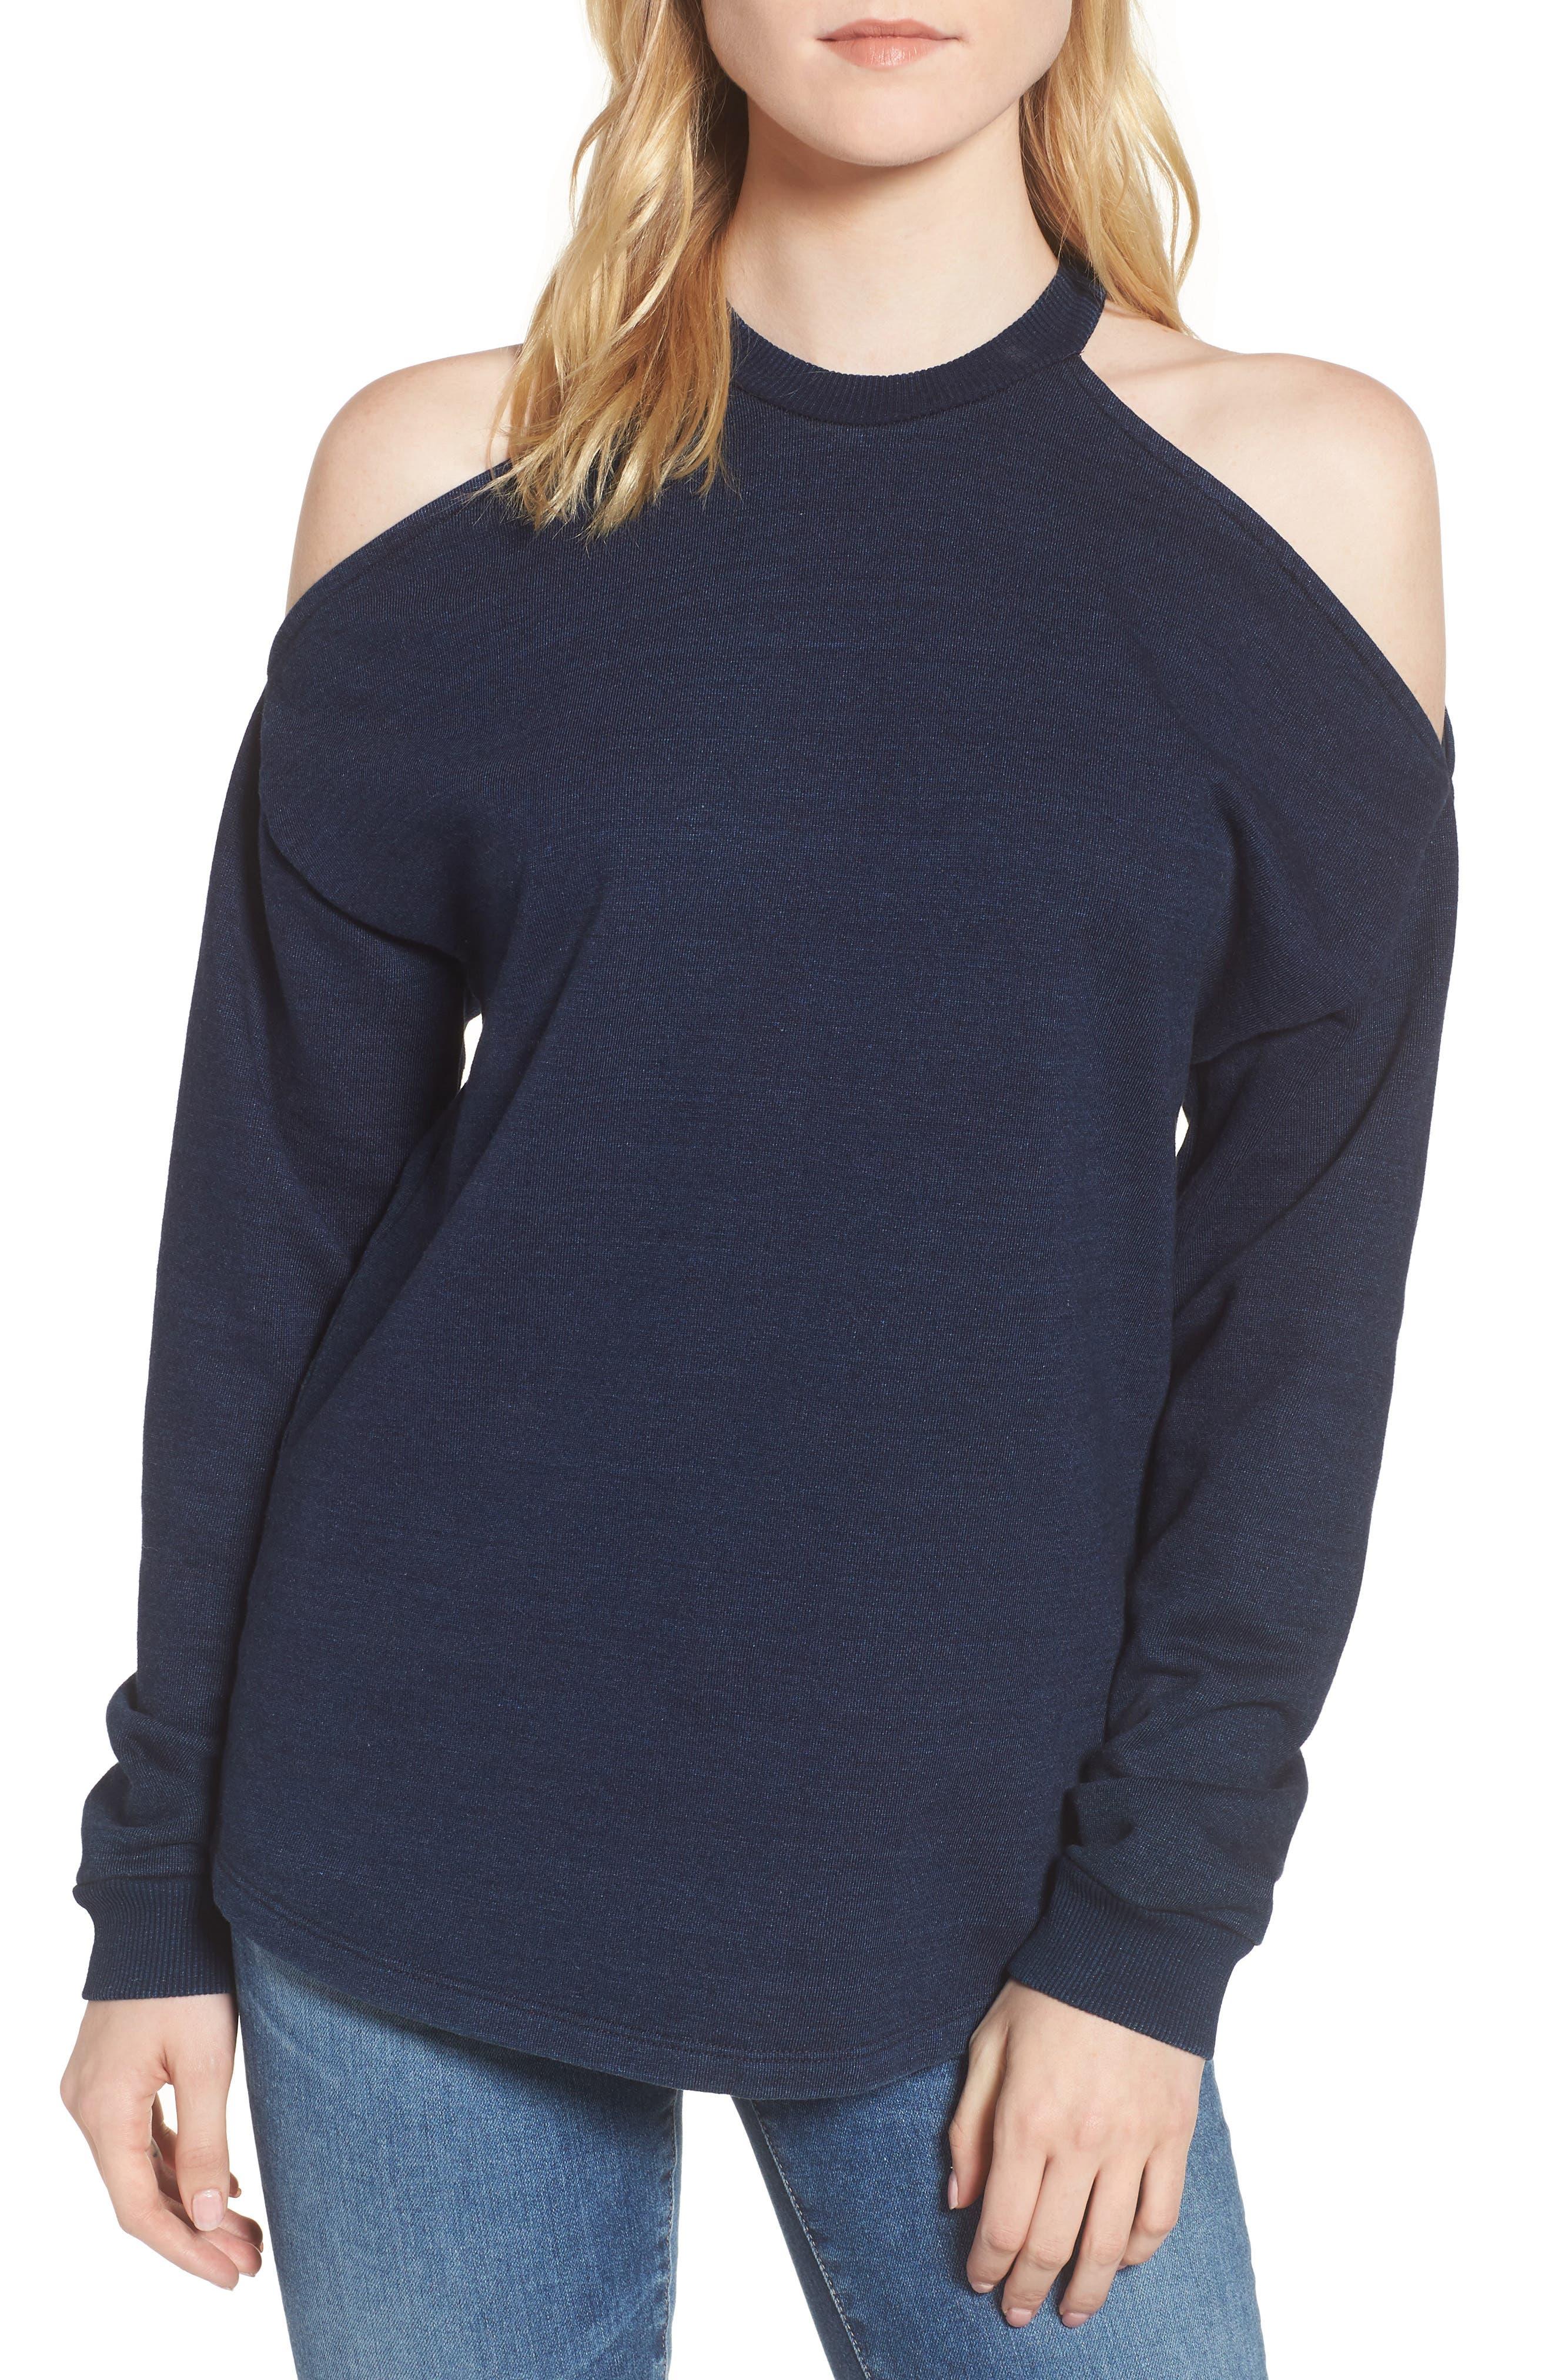 Gizi Cold Shoulder Sweatshirt,                             Main thumbnail 1, color,                             489